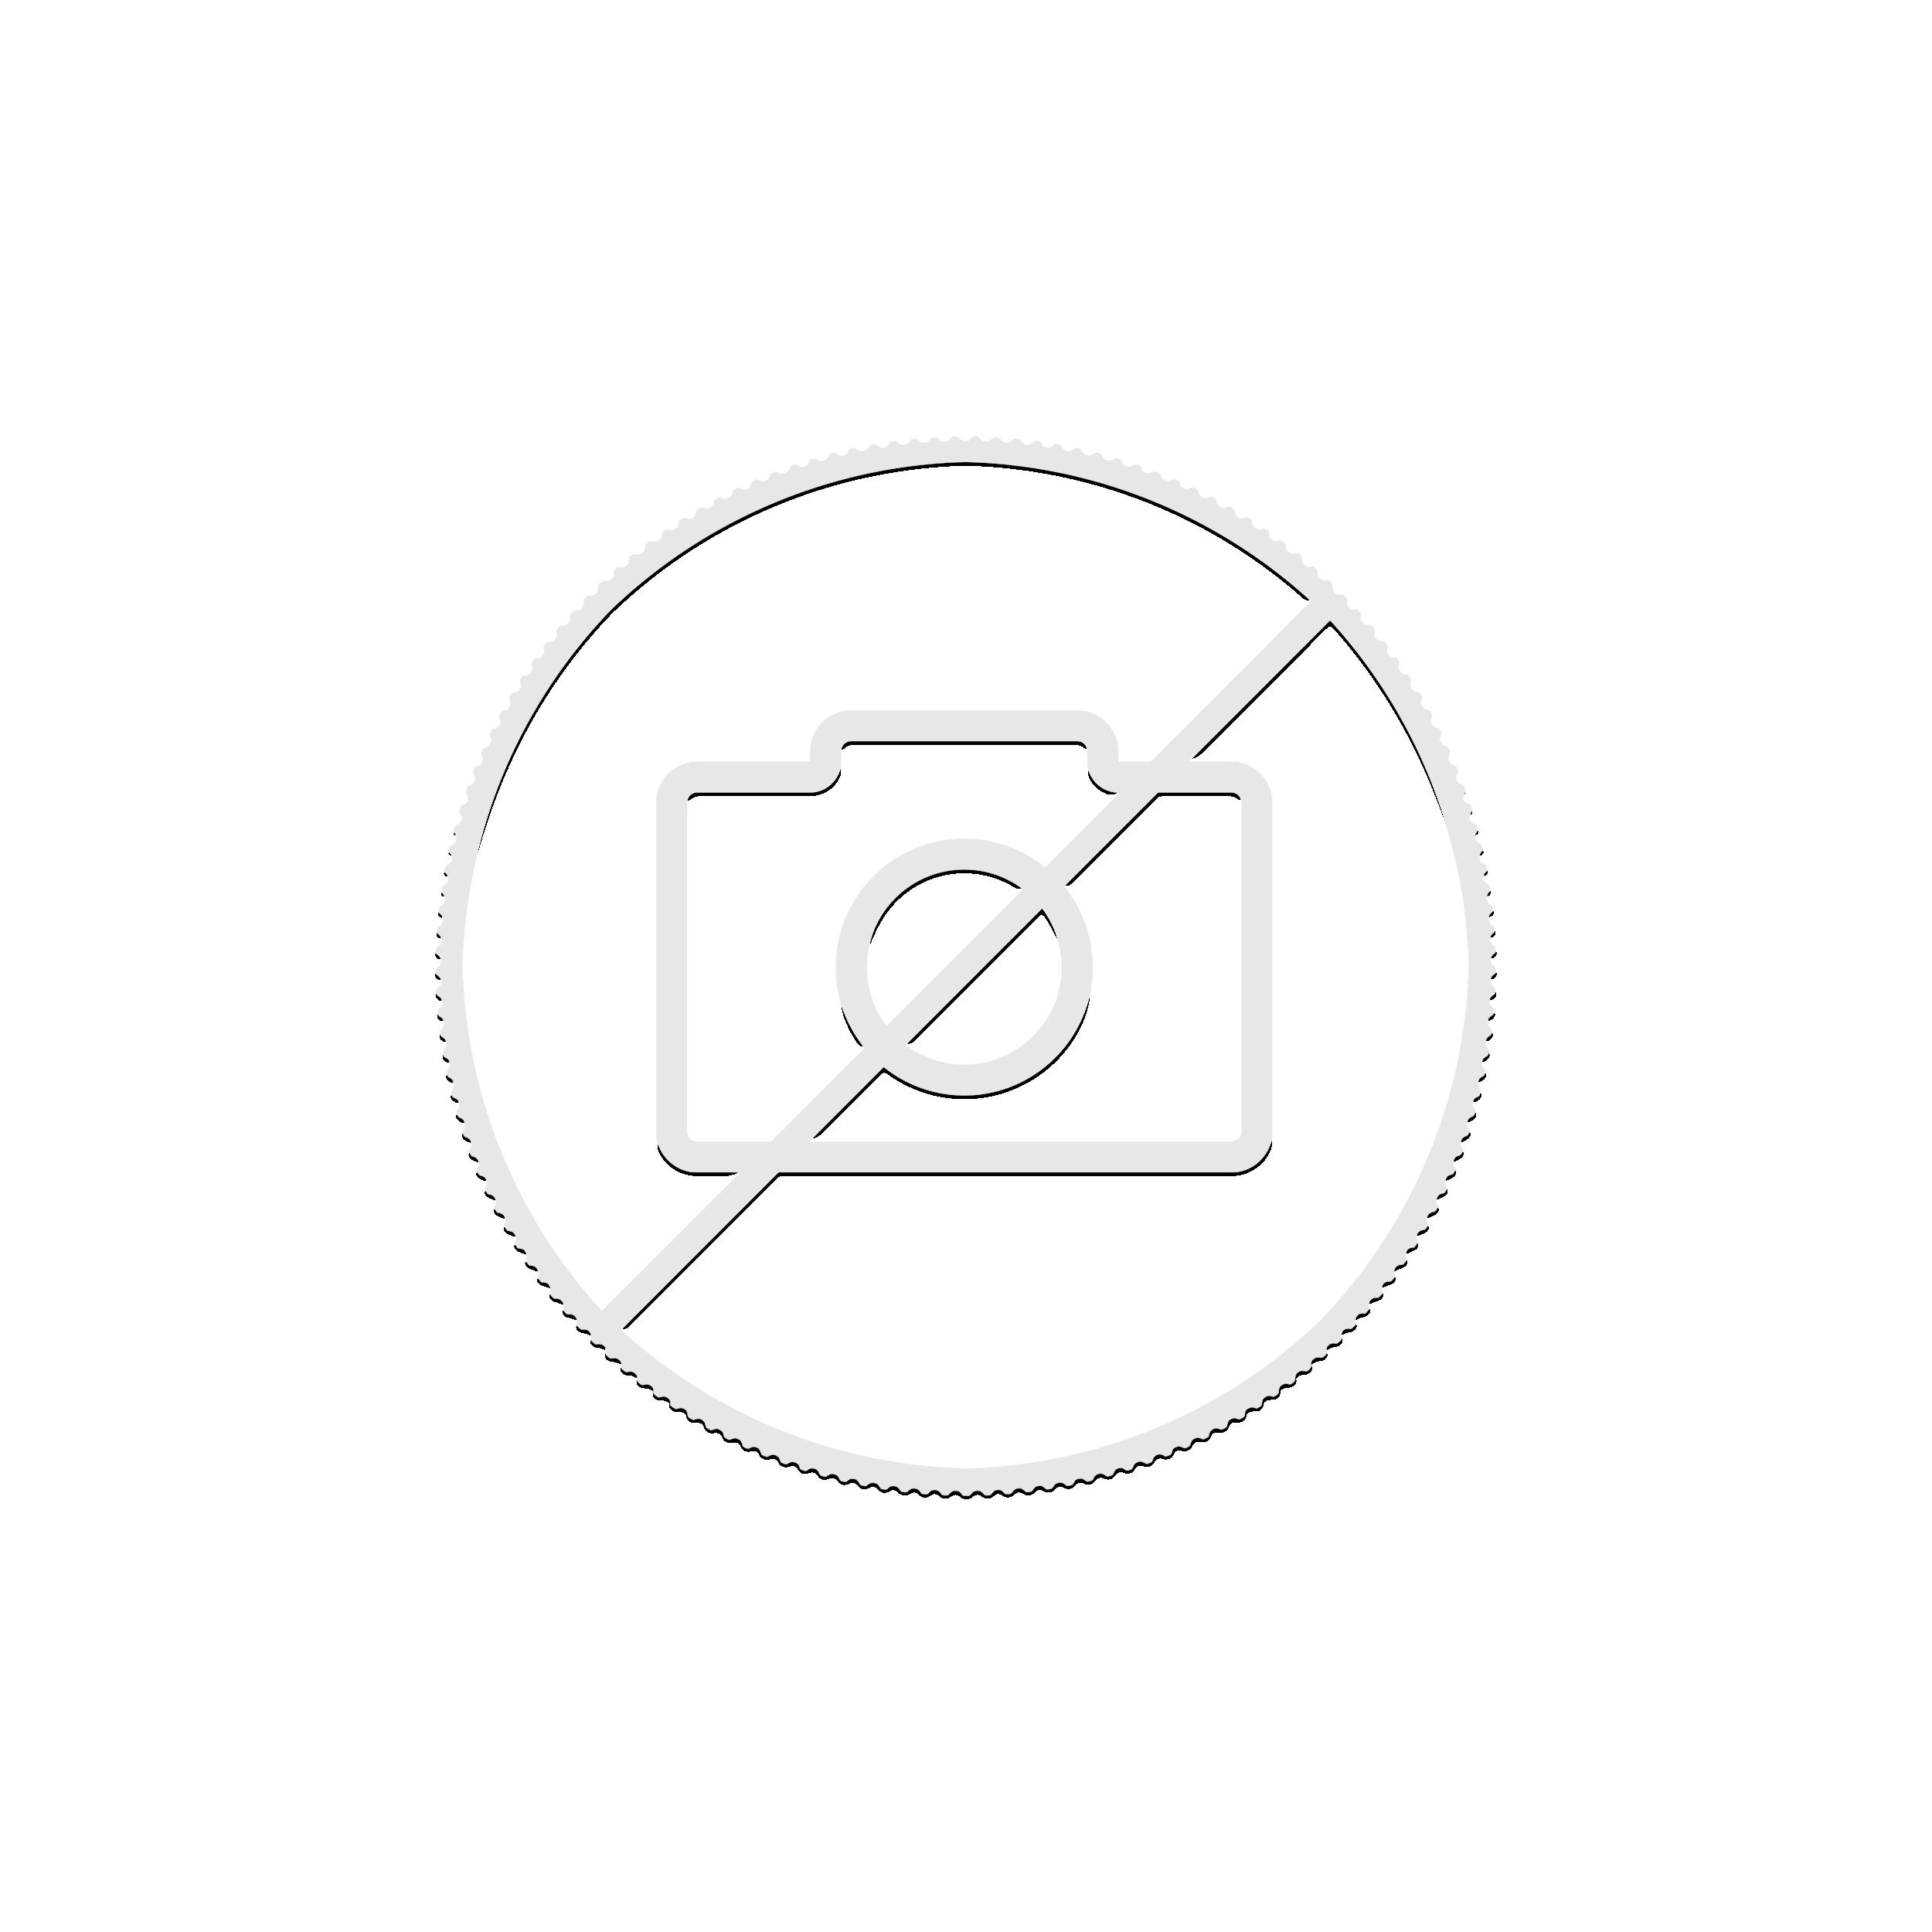 5-Delige gouden munten set Panda 2017